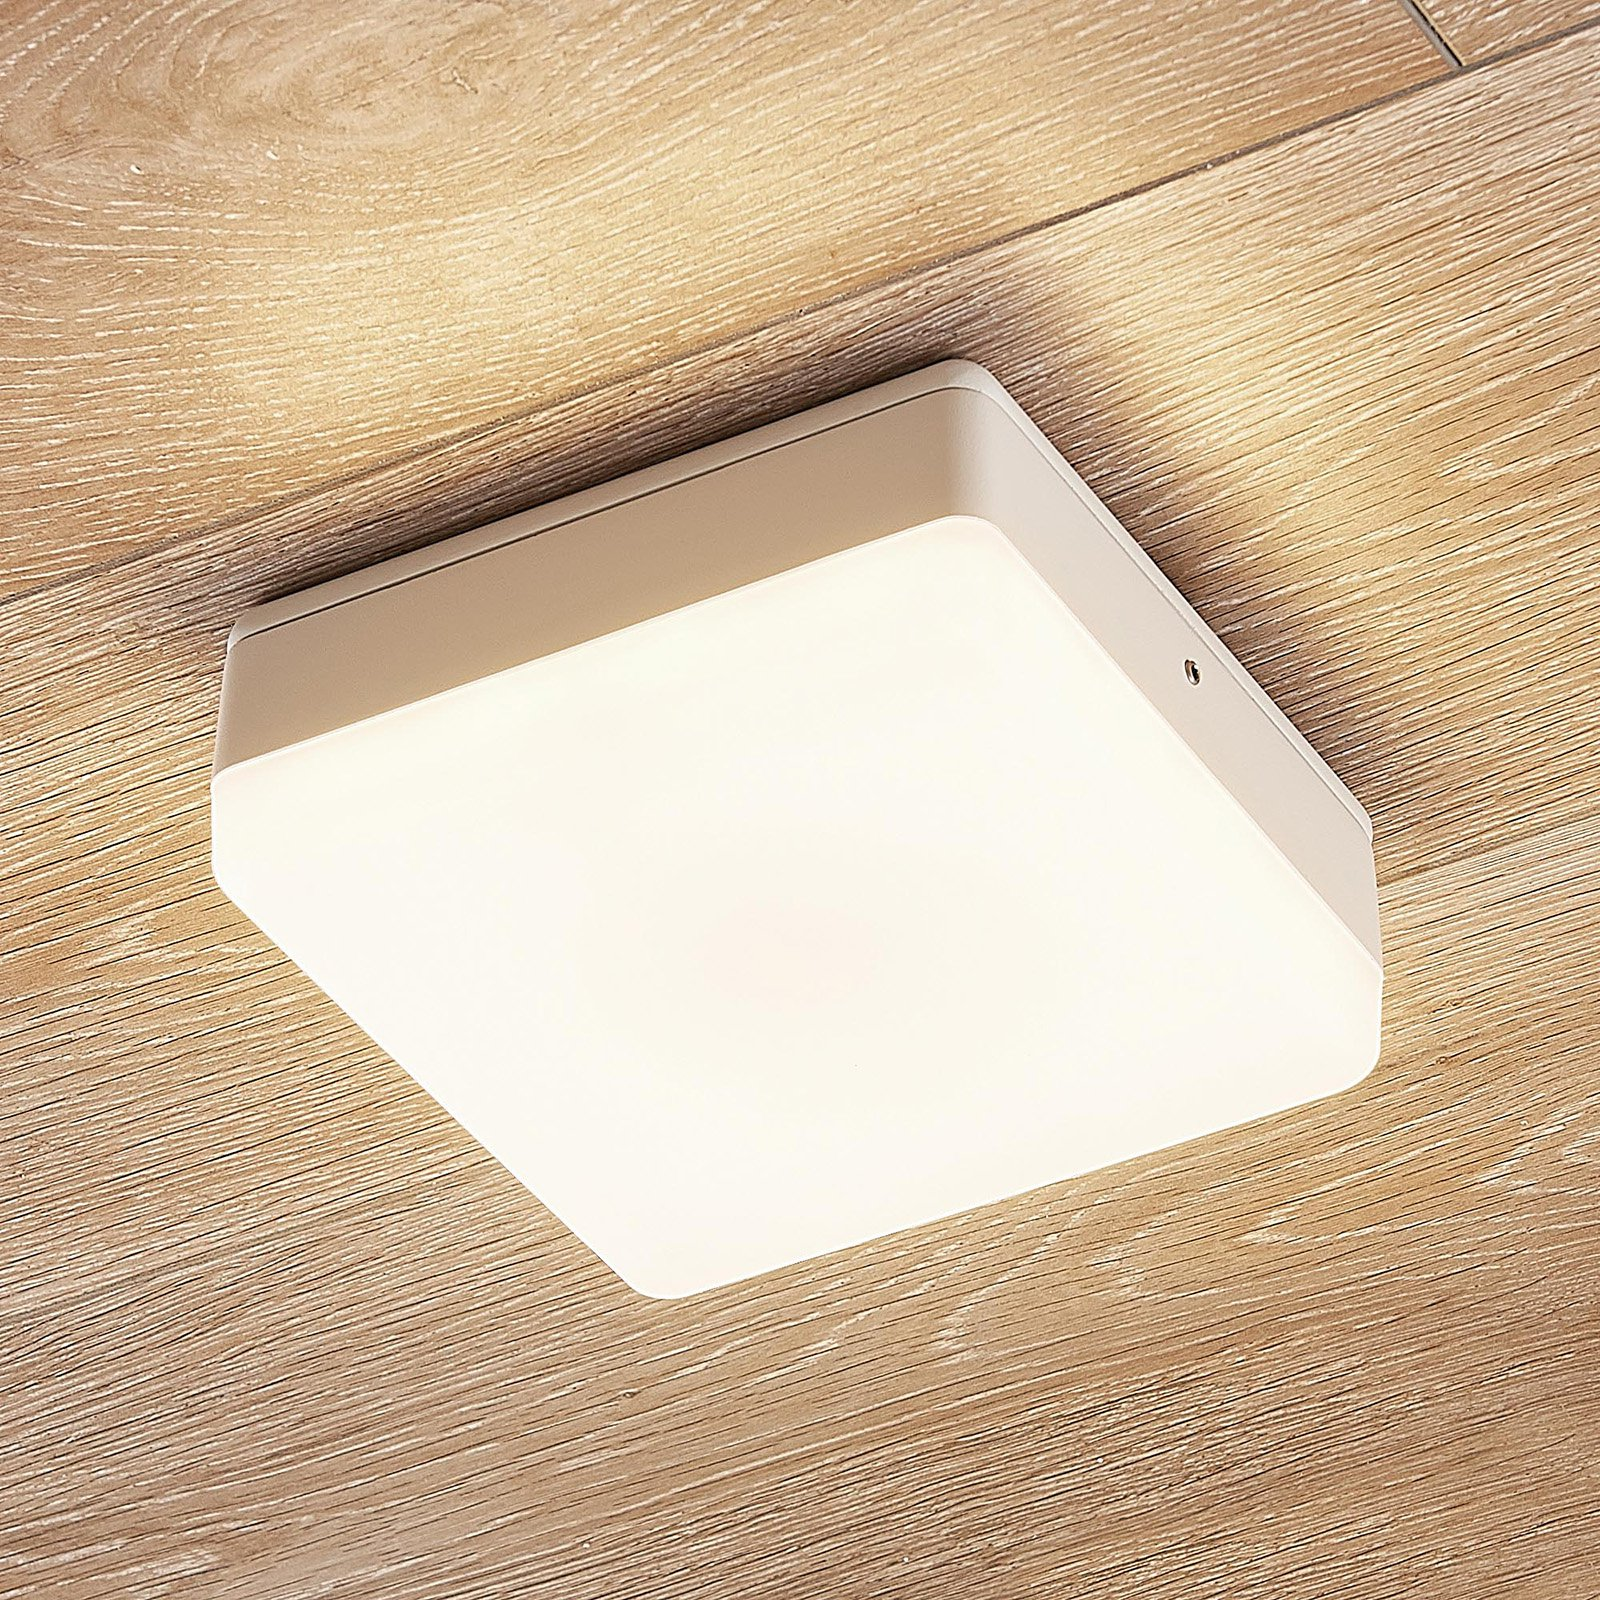 LED-taklampe Thilo, IP54, hvit, 16 cm